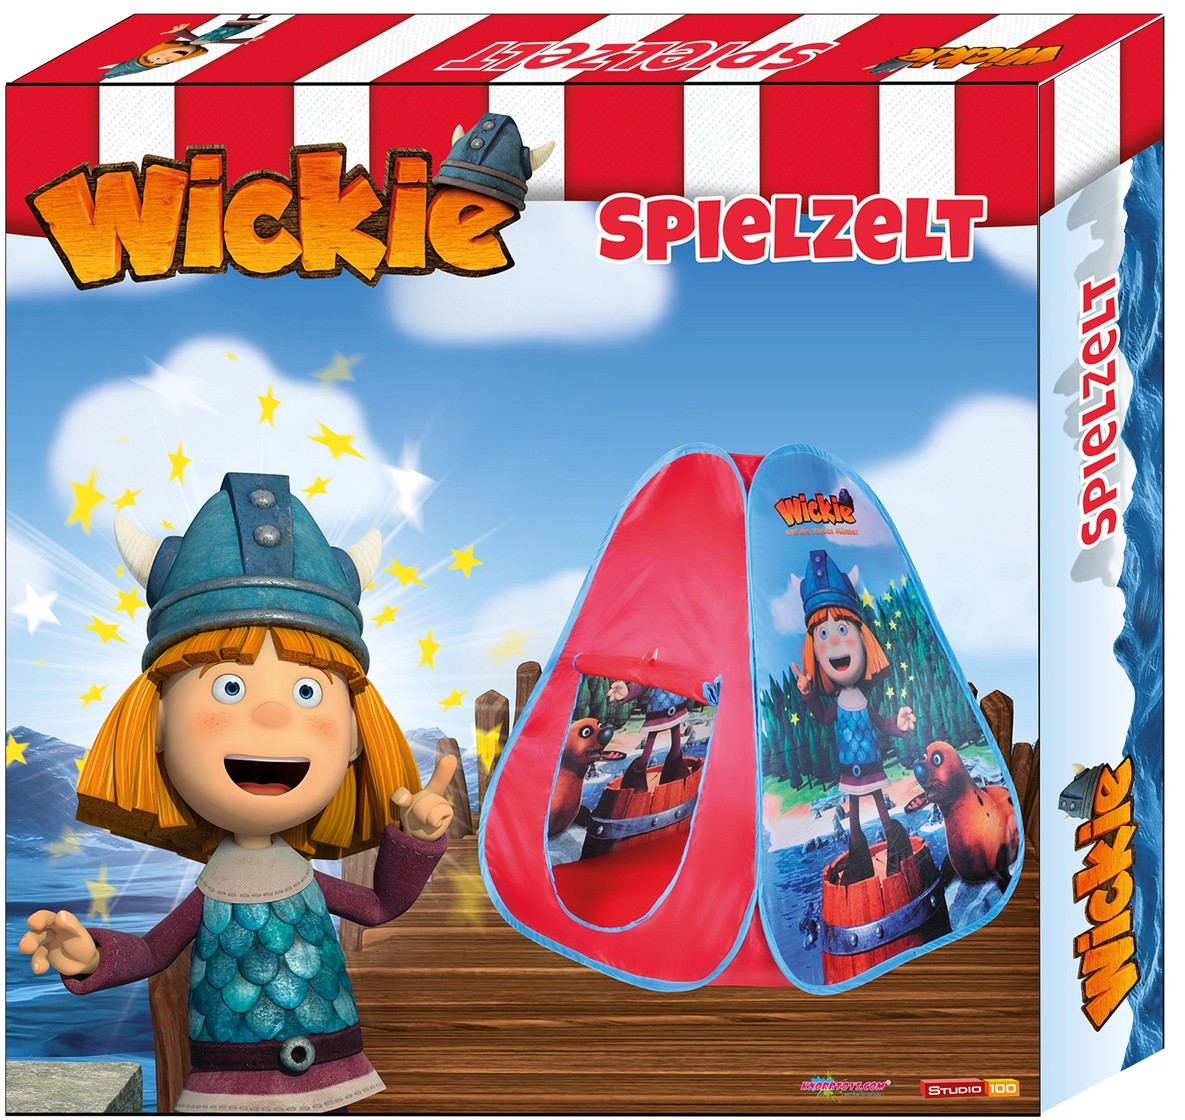 Cort De Joaca Pentru Copii Wickie Pop Up